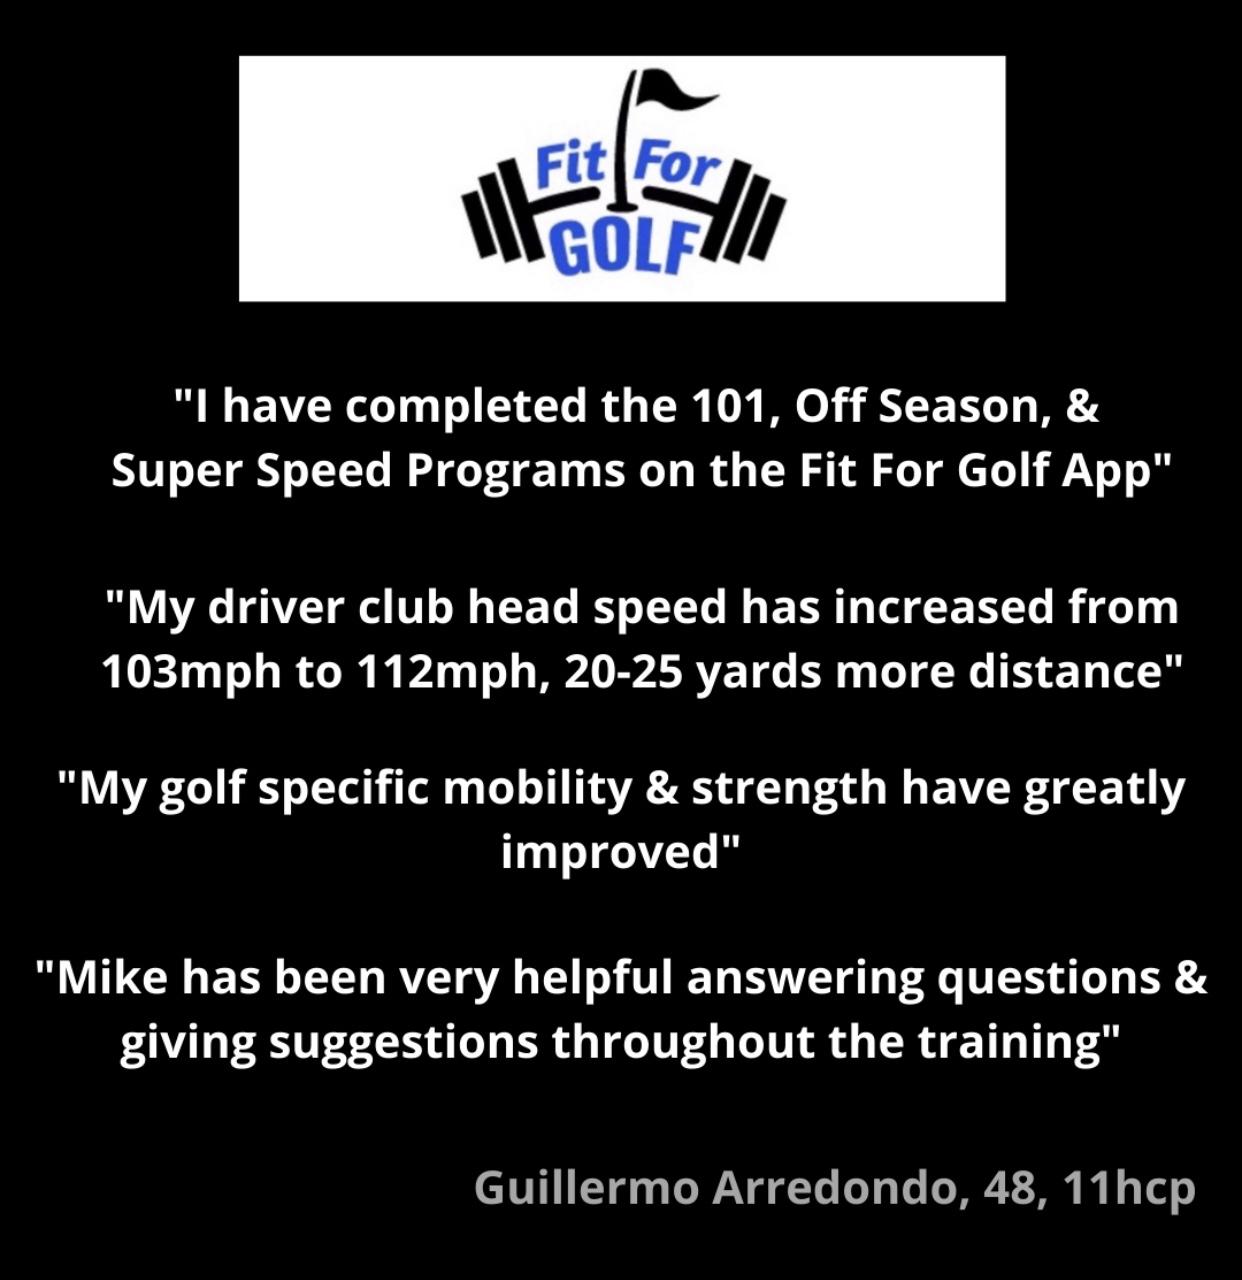 Super Speed Program Increases Club Head Speed 9 MPH